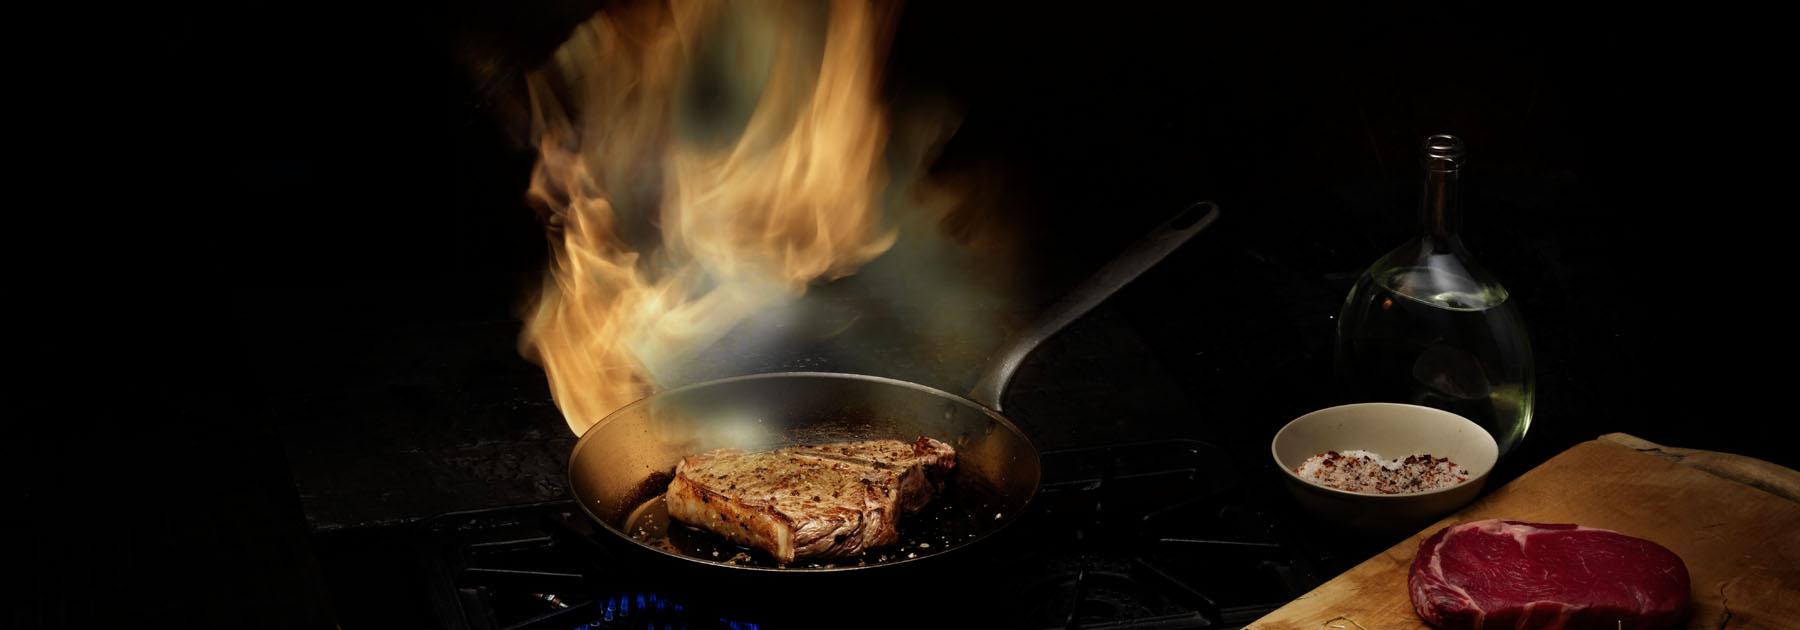 25% OFF, frying, pans, woks, sale, promotions